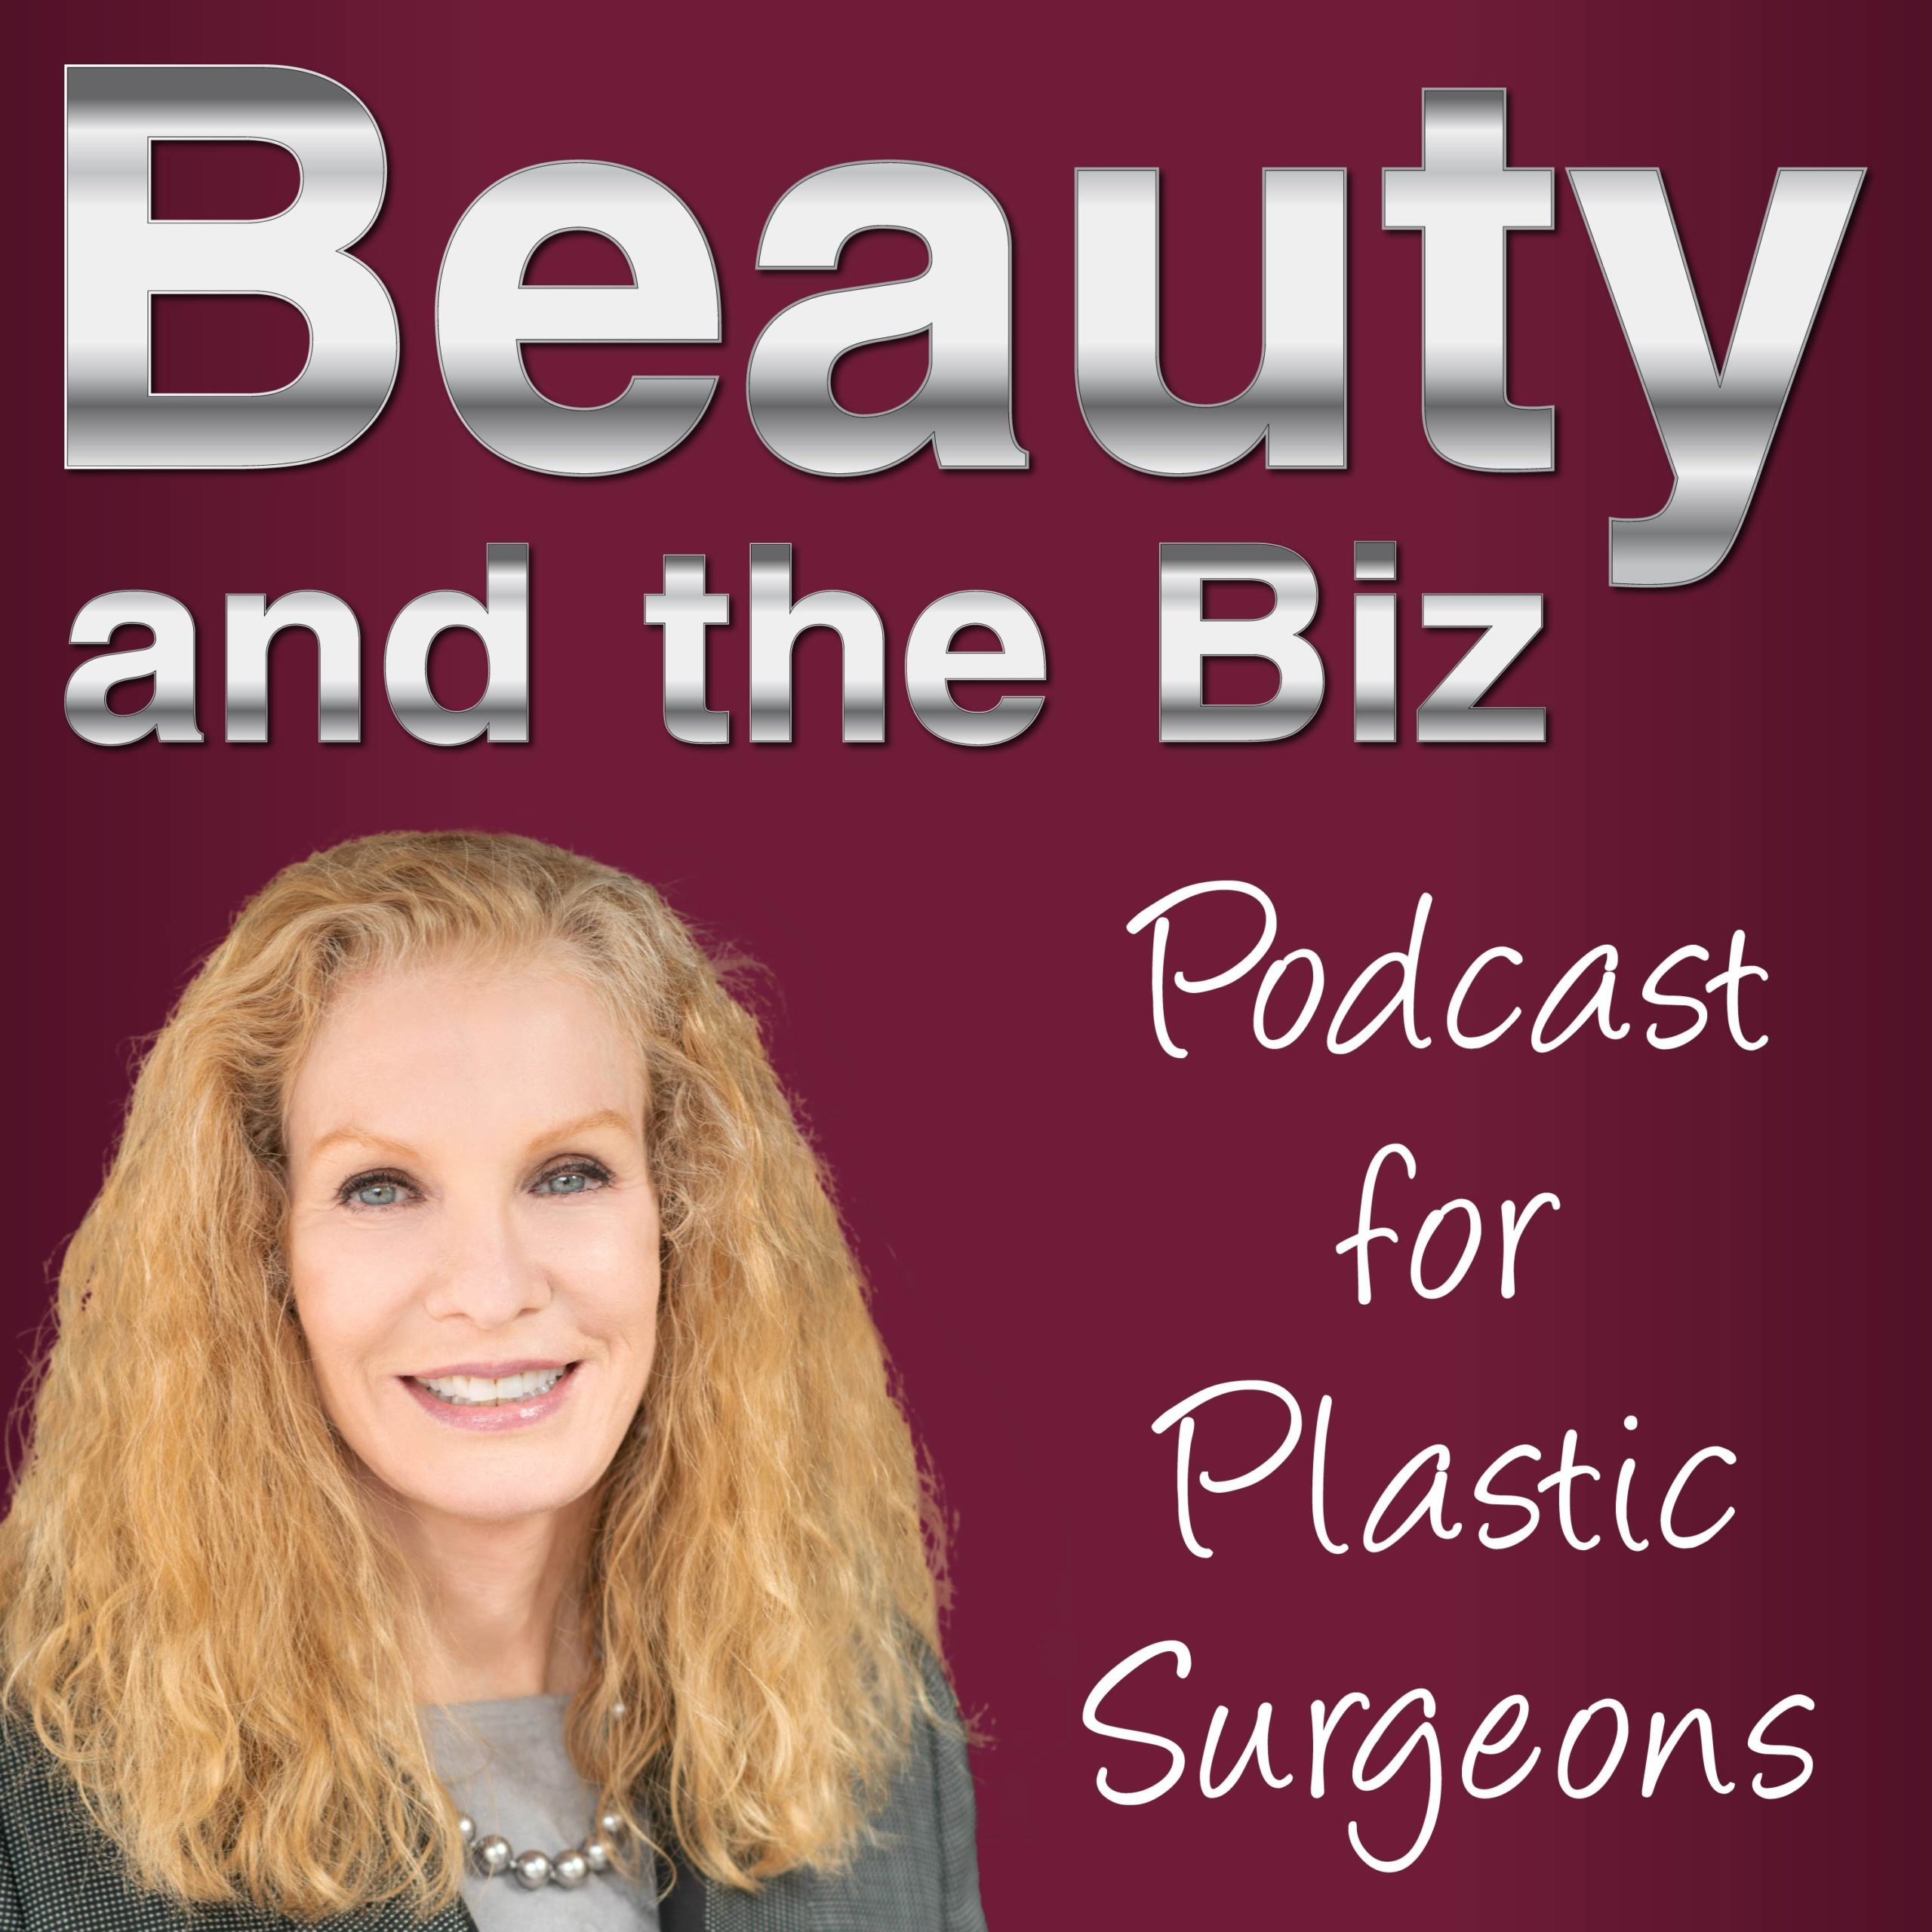 Podcast Marketing for Plastic Surgeons